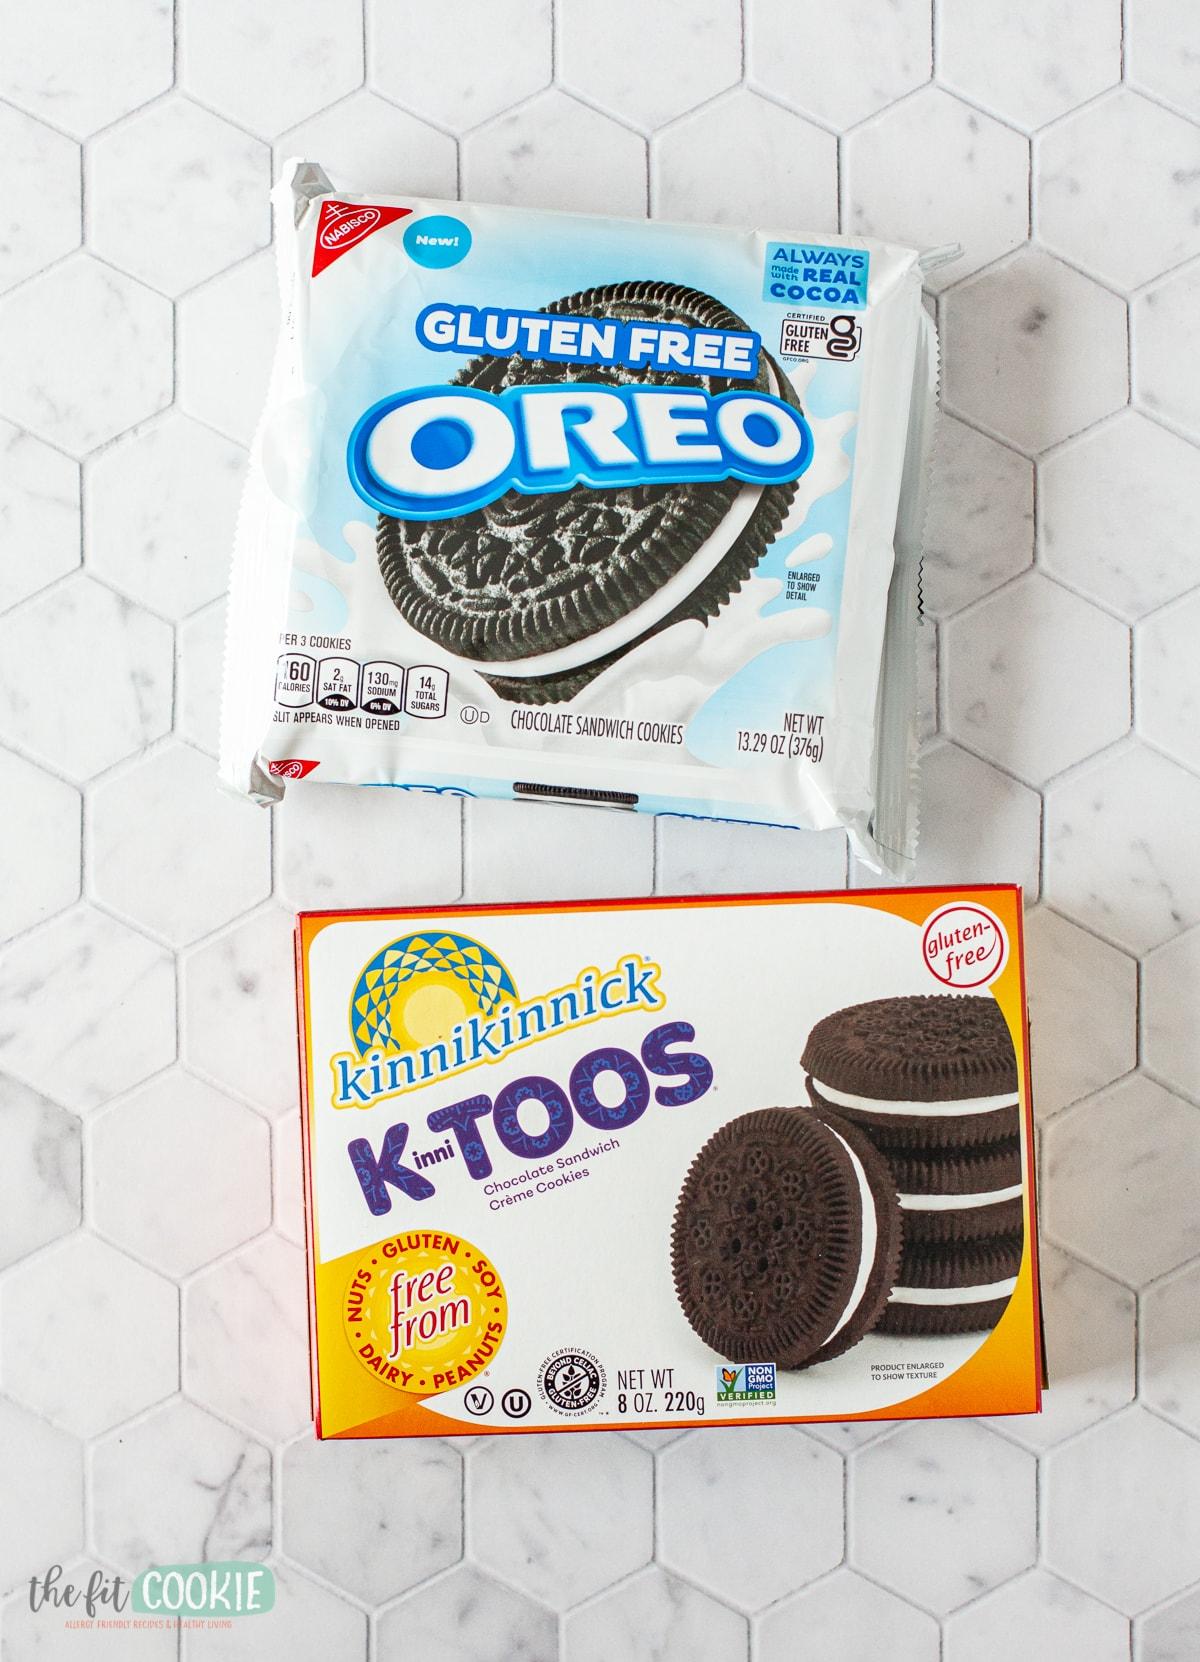 gluten free oreos and gluten free kinnitoos cookies